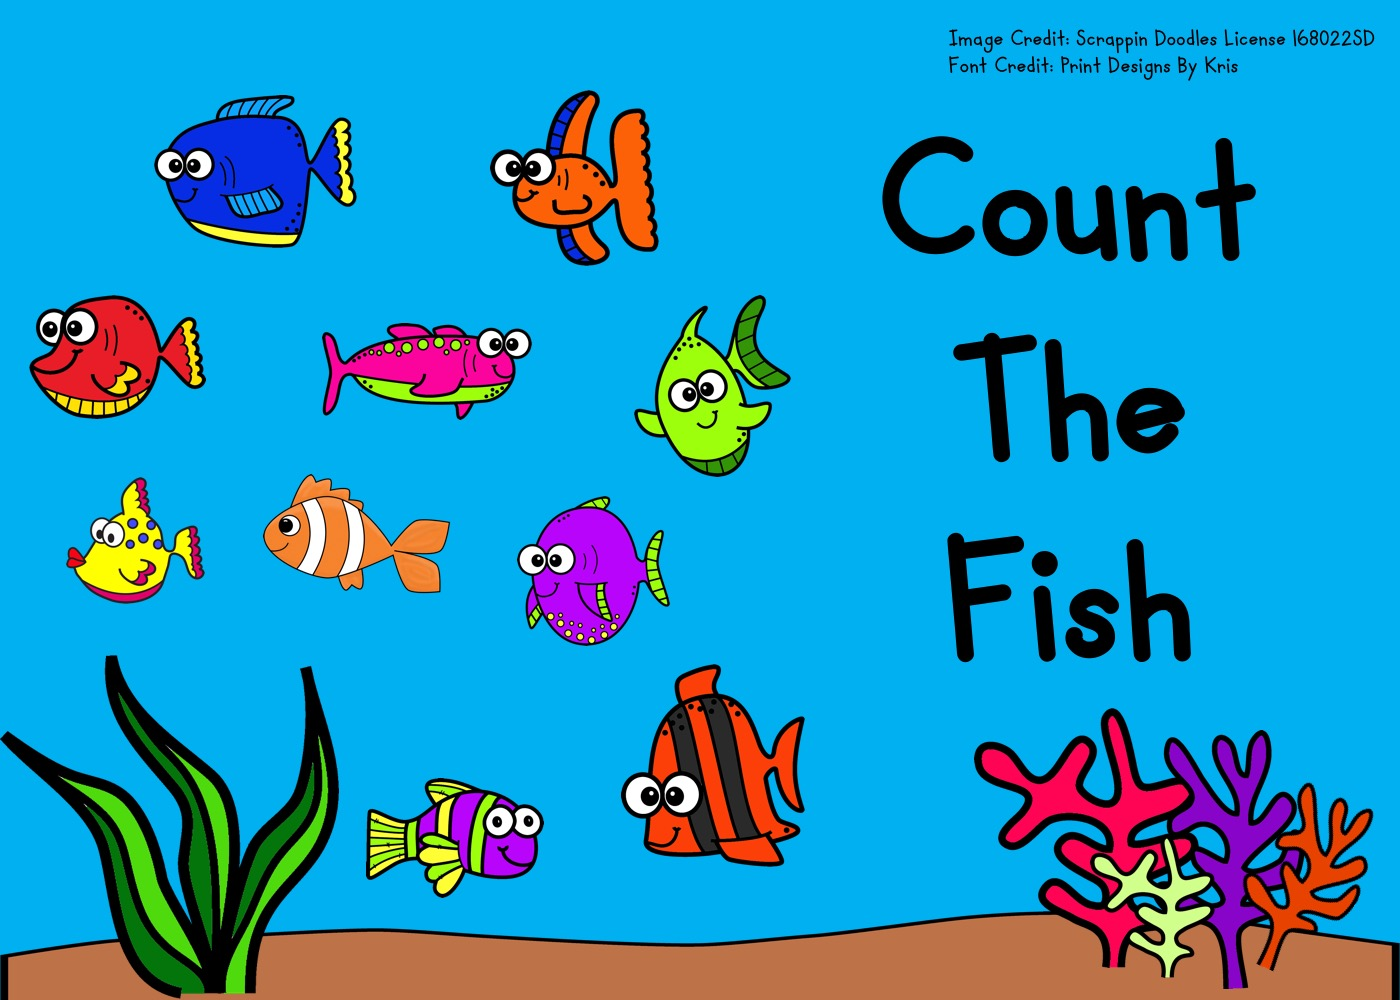 Fun Fish Printables for Preschool and Kindergarten   Ocean Themed Summer Games   Hands On Math Homeschool Activities   Kids Classroom Center Ideas and Worksheets #FreePrintableWorksheetsForKids #fish #ocean #summer #clipcards #counting